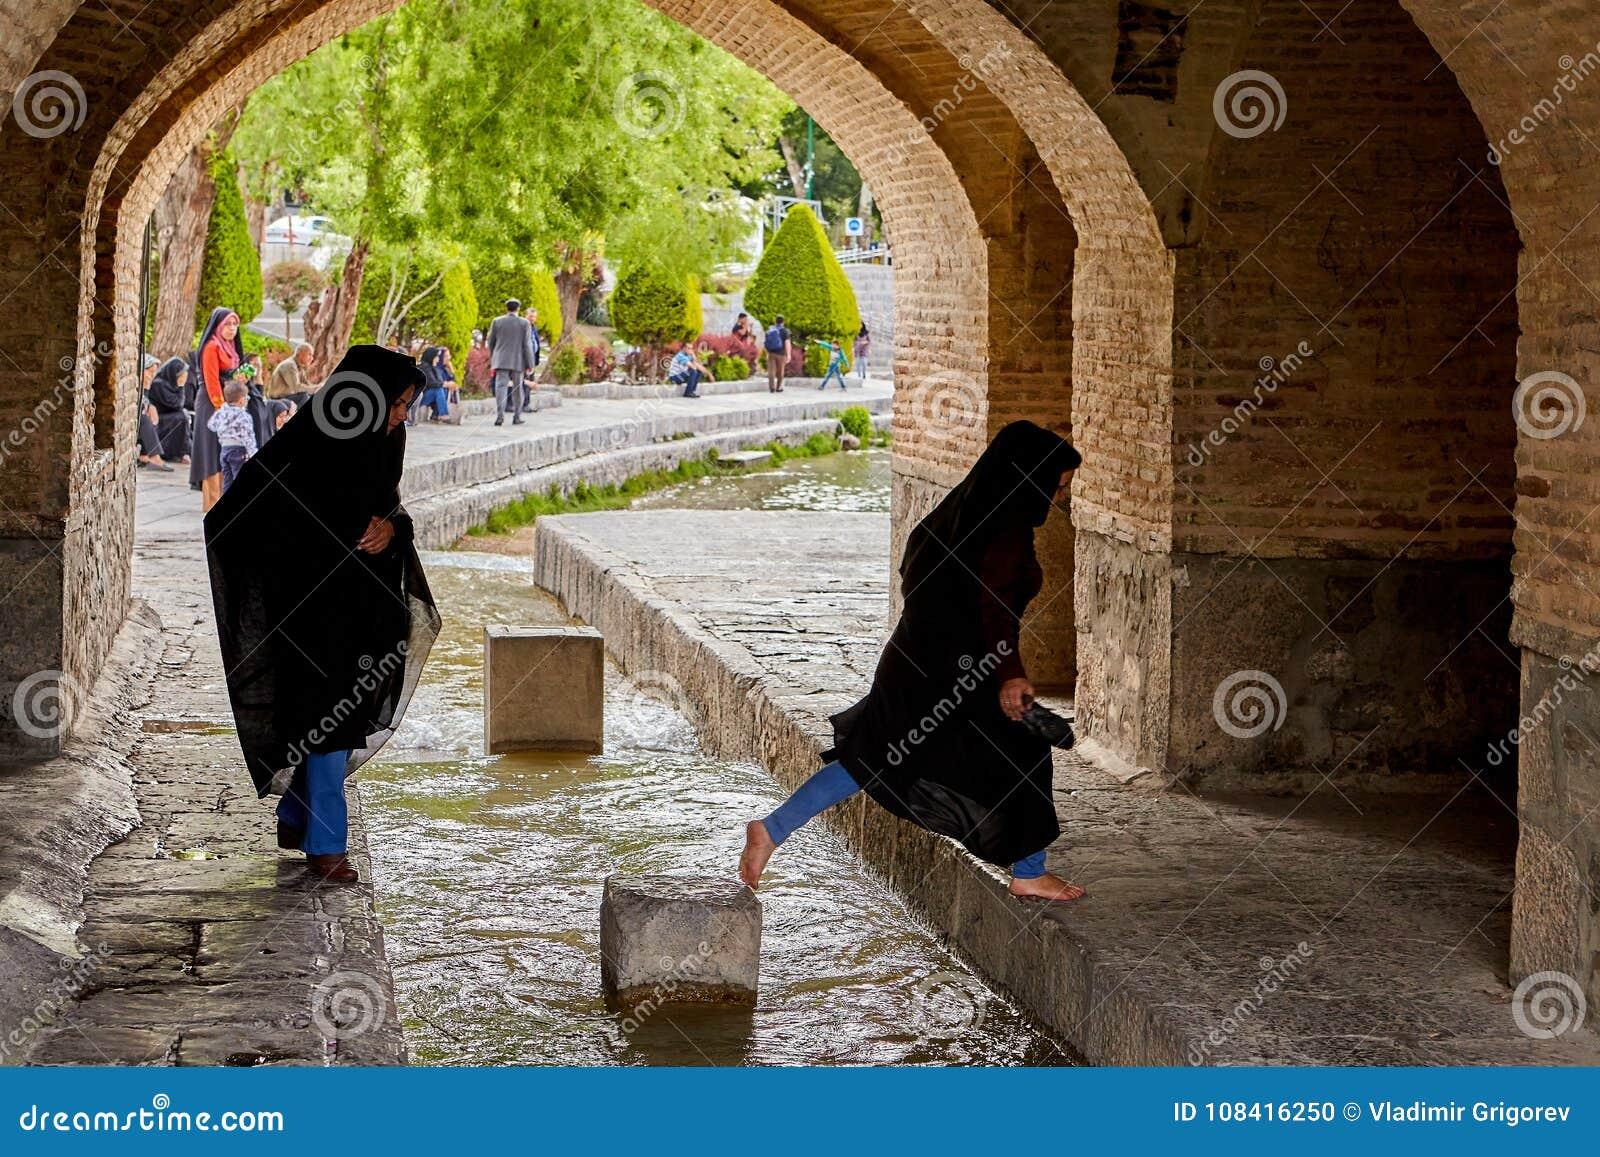 1dfefacb5190 Iranian Girls Step Over Flow Of Water Under Bridge